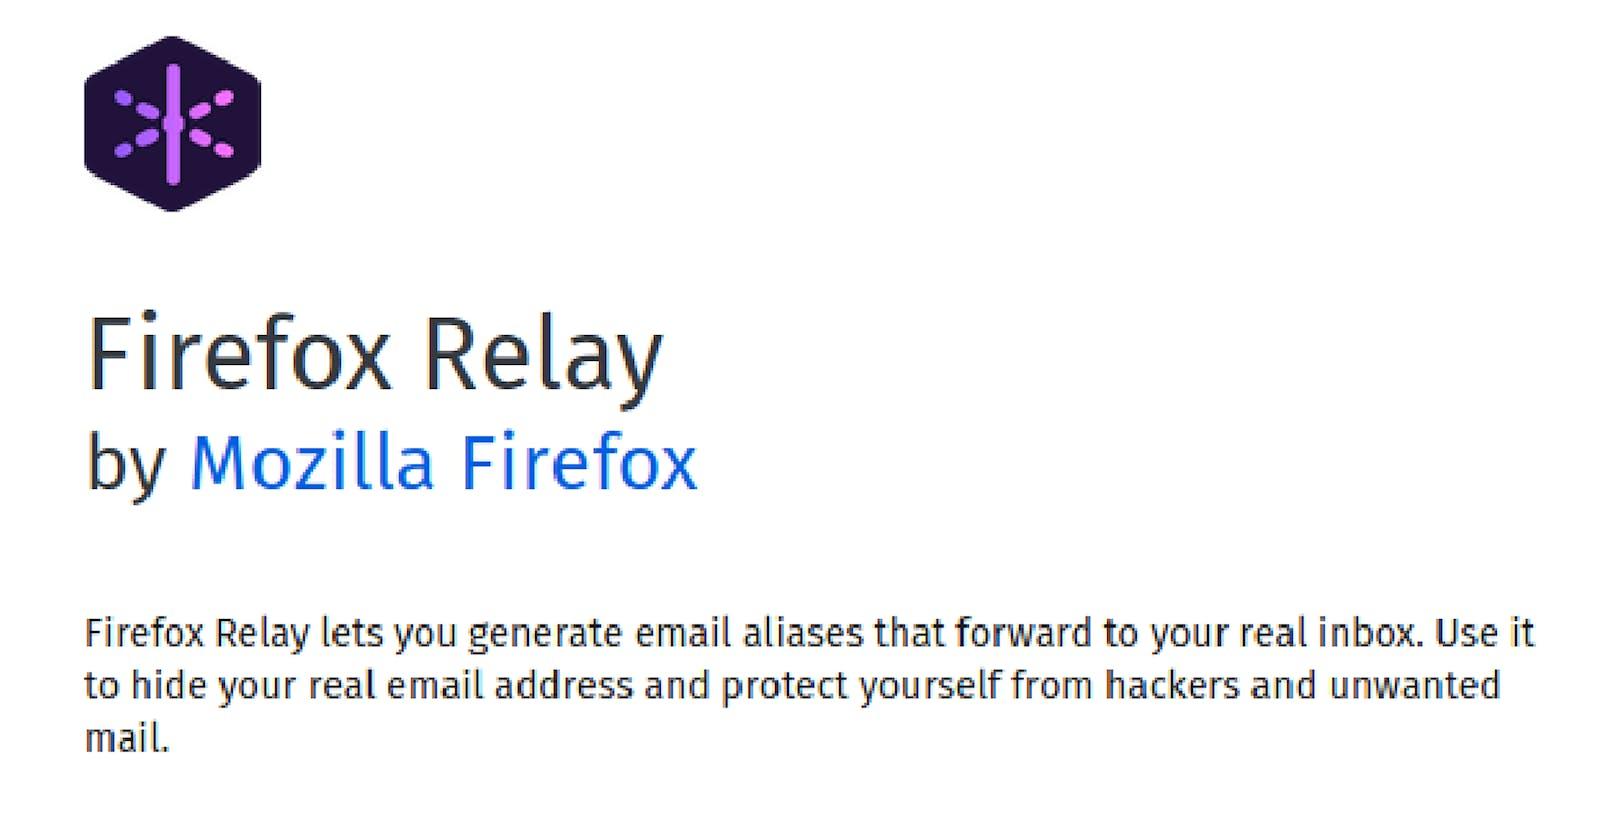 Protege tu correo de spam con Firefox Relay